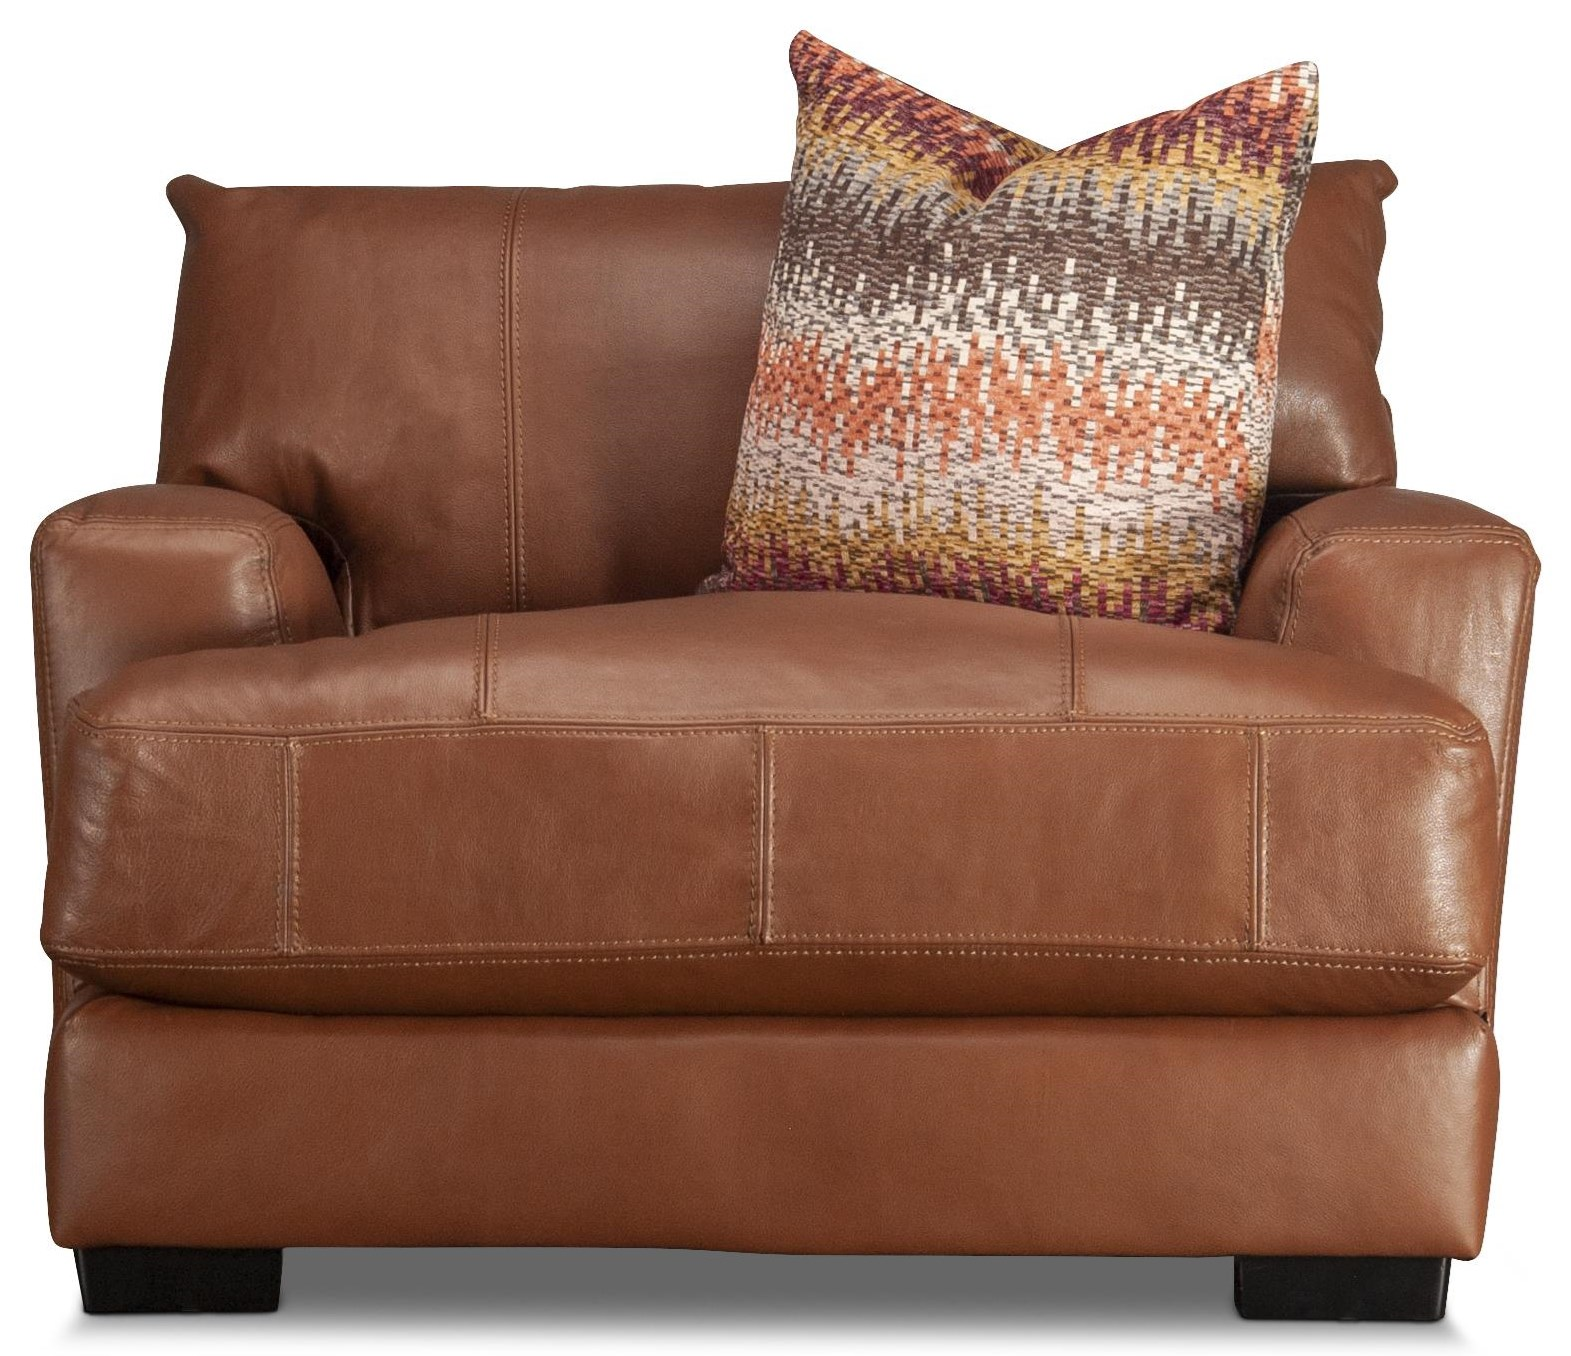 Blair Blair Leather Match Chair by Franklin at Morris Home